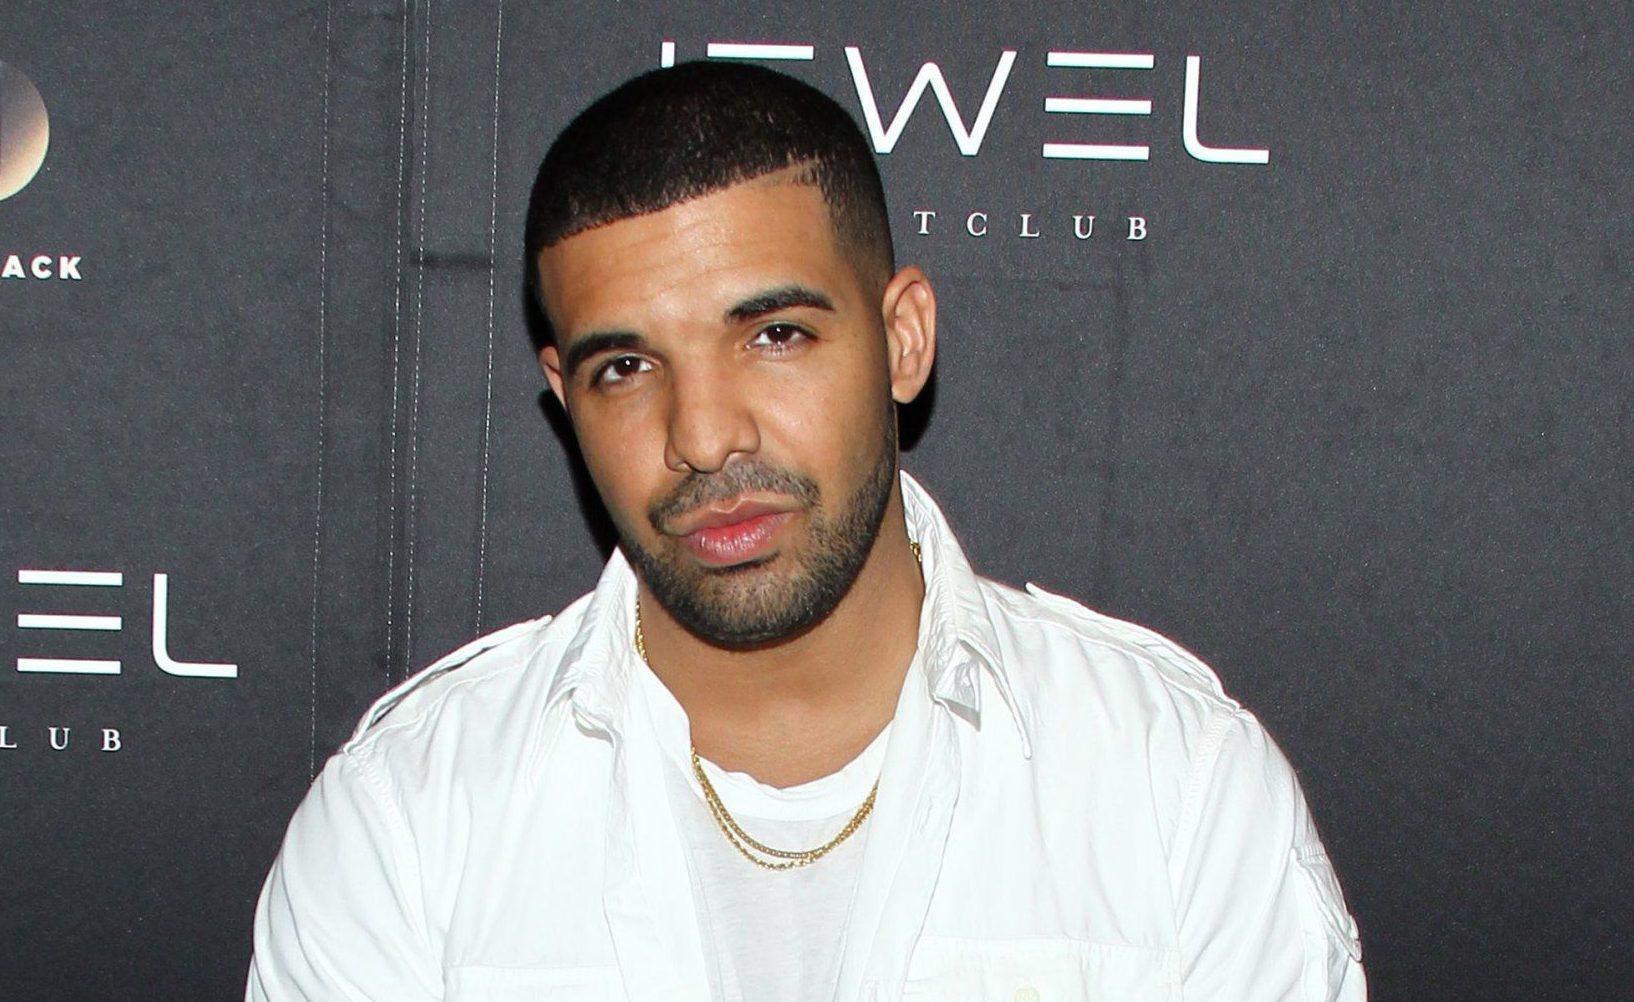 Justin Bieber just ruined any chance Drake had of beating Bryan Adams' chart record